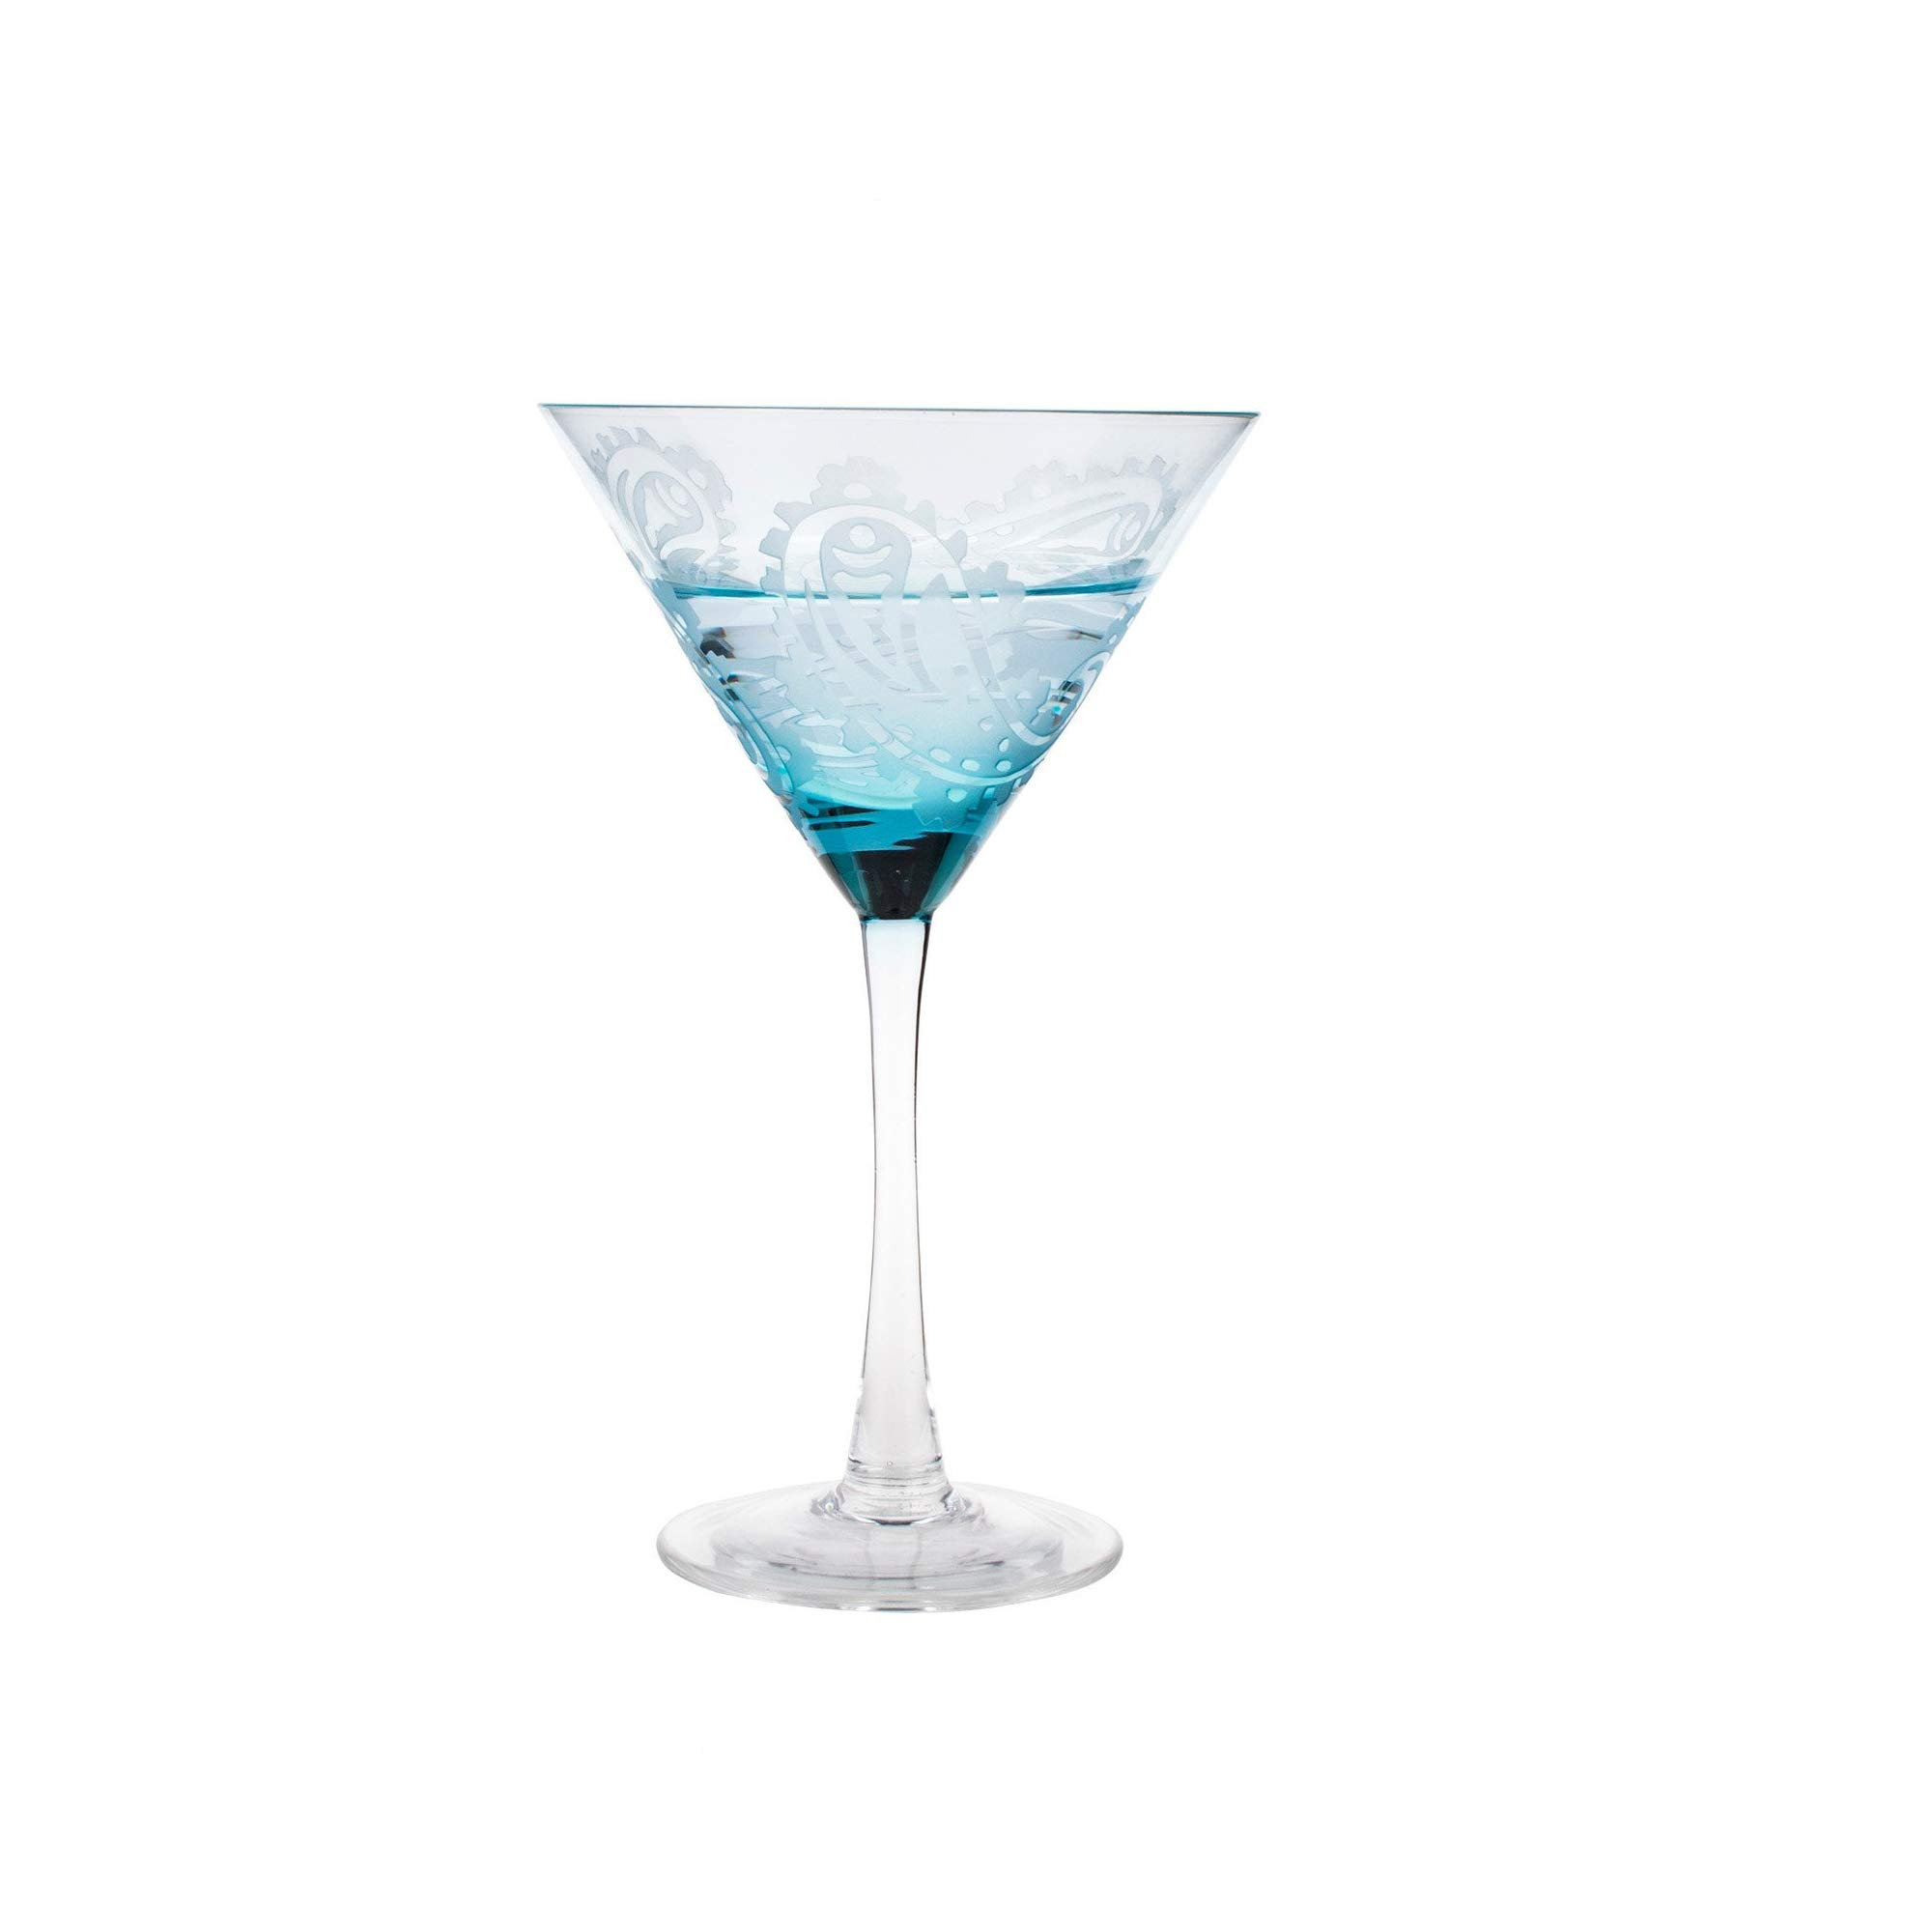 EssenceLiving Stemmed Martini Cocktail Glasses, Mouth Blown Glass Blue Etched Wine Glasses, Fantastic Gift for Him, Wedding Gifts(Blue)